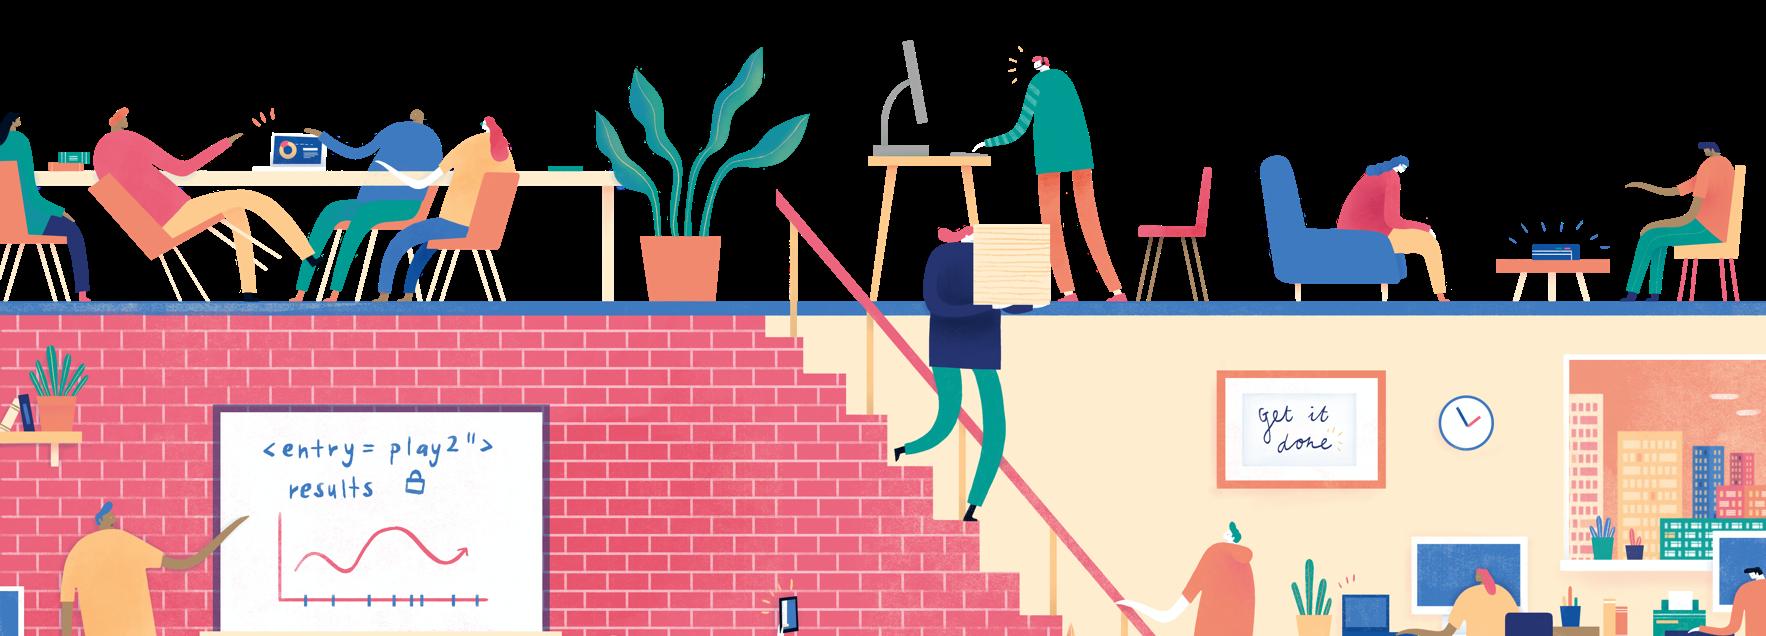 Increment illustration